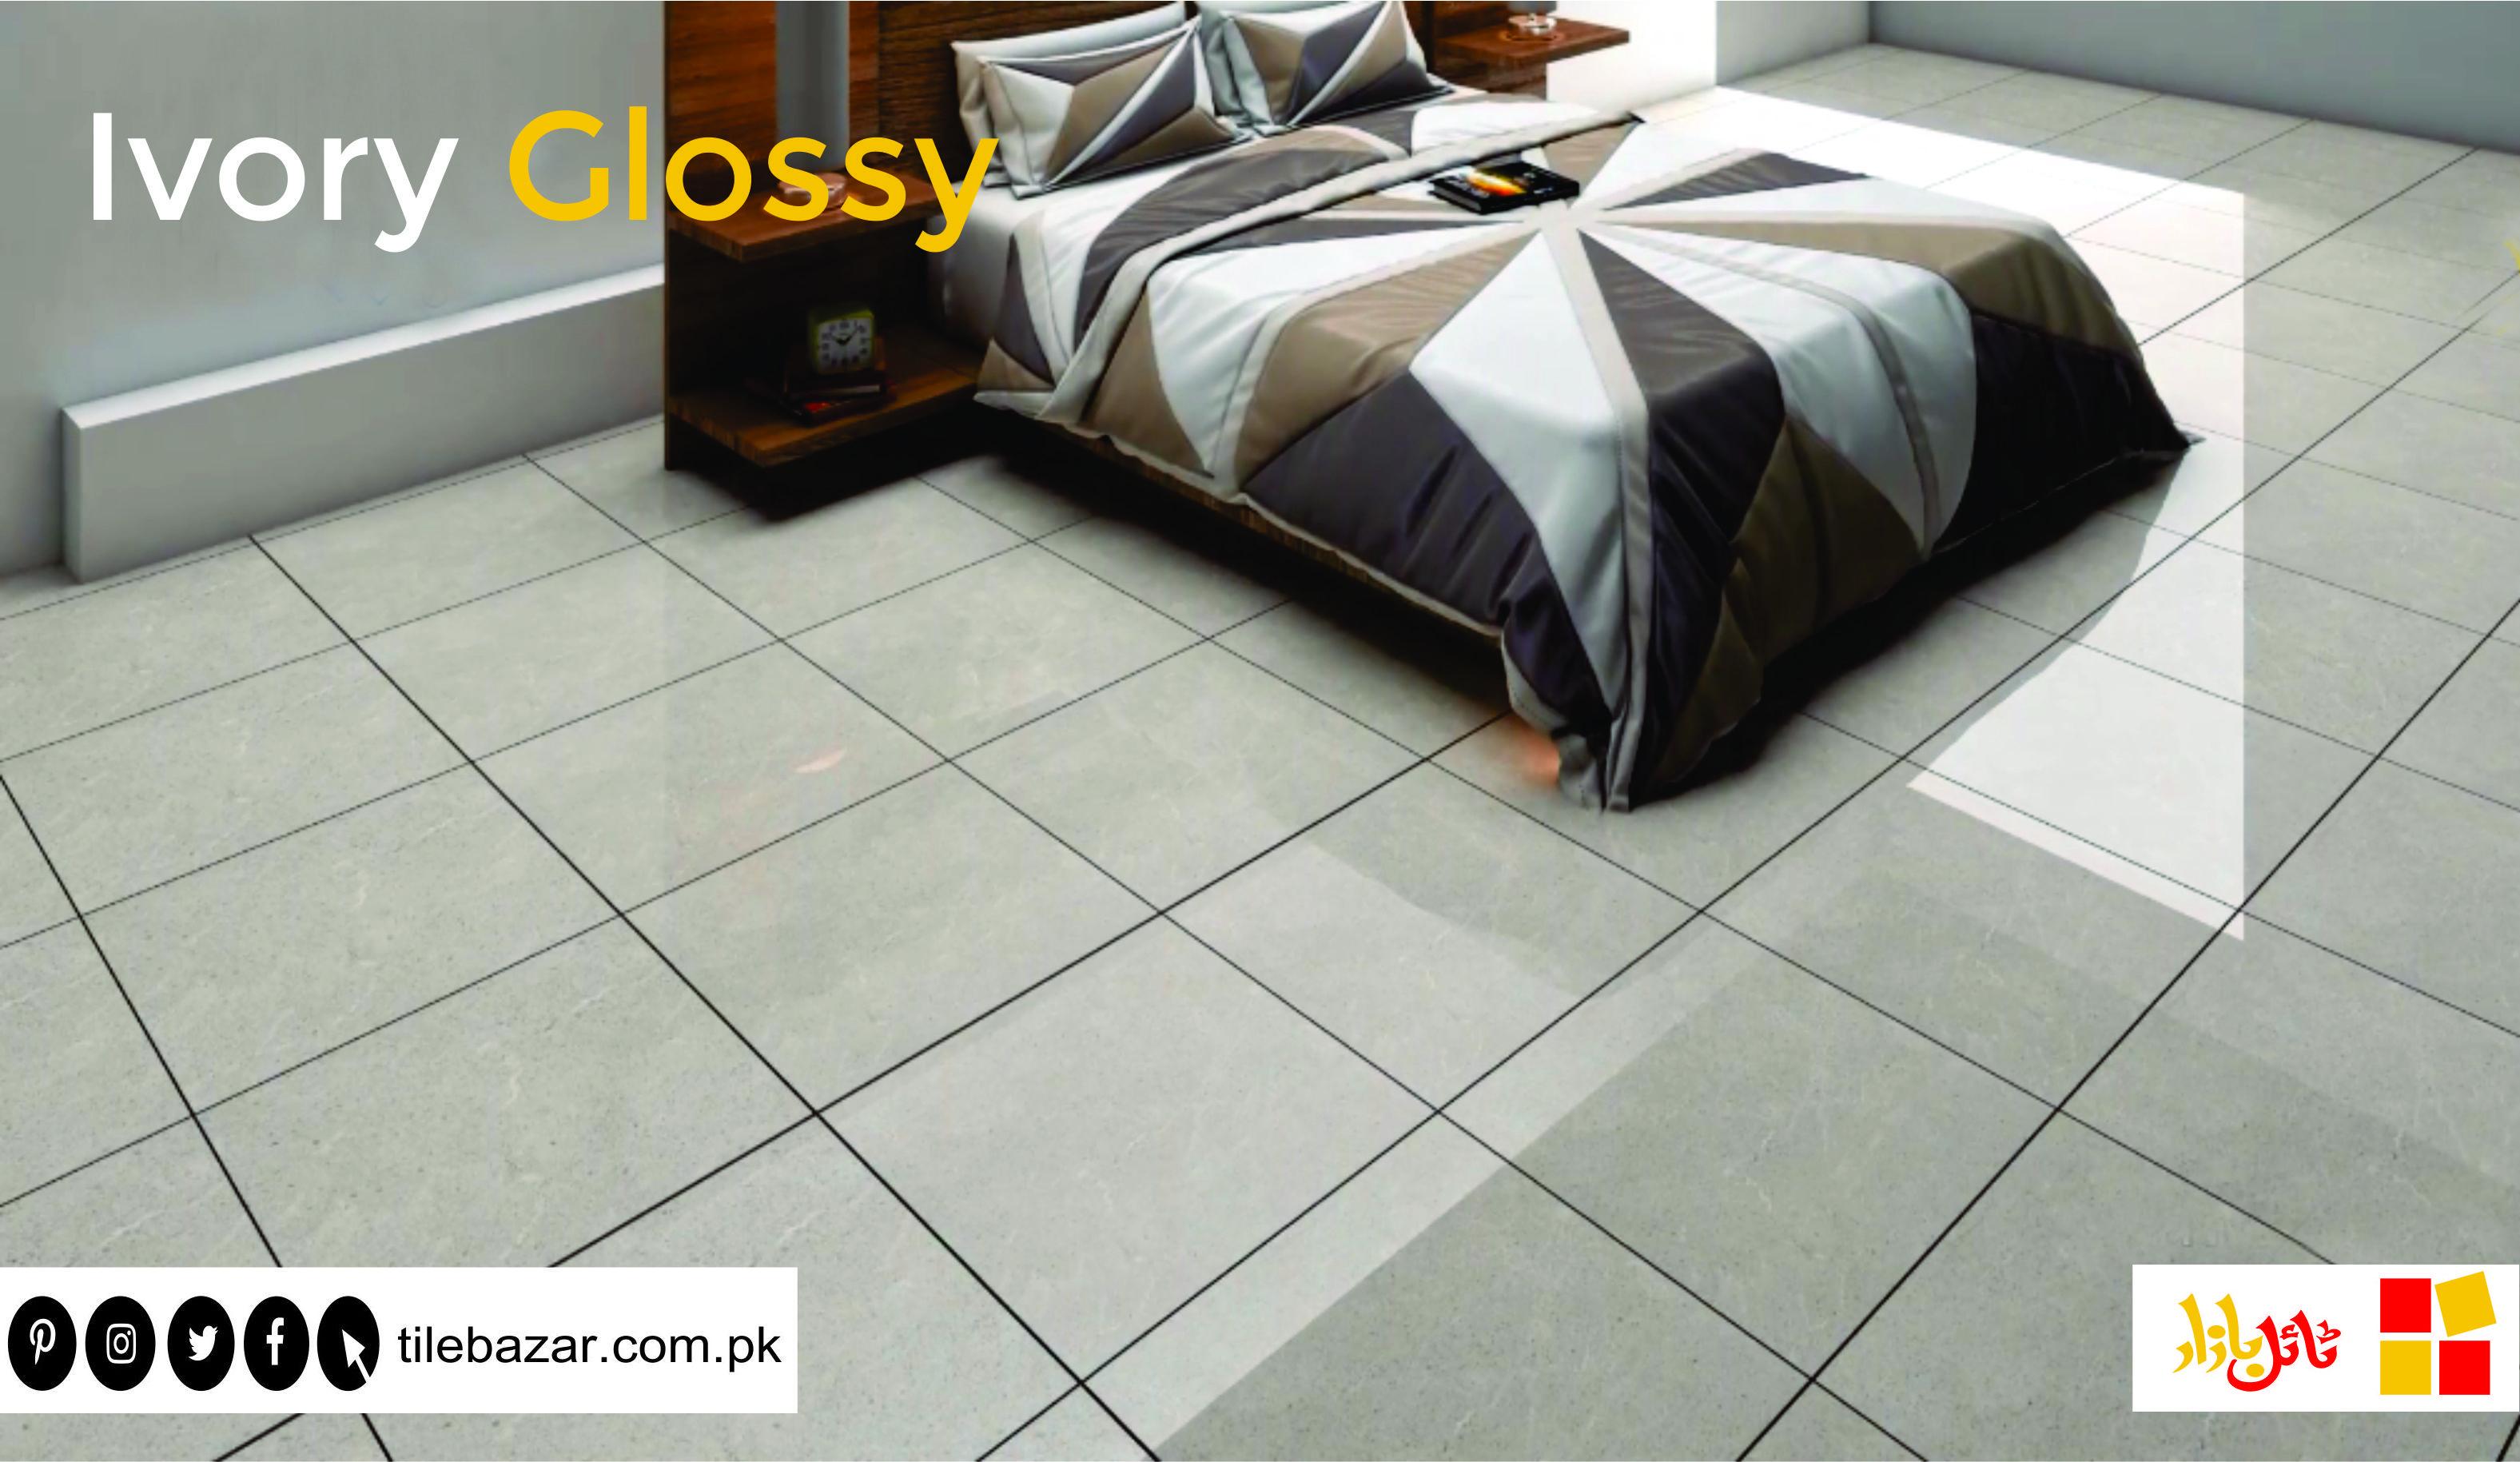 Ideal Ivory Glossy Tiles For Your Floor Visit Our Nearest Outlet For Floortiles Walltiles Ceremicstile Porcelaintile Homed Tile Floor Flooring Wall Tiles